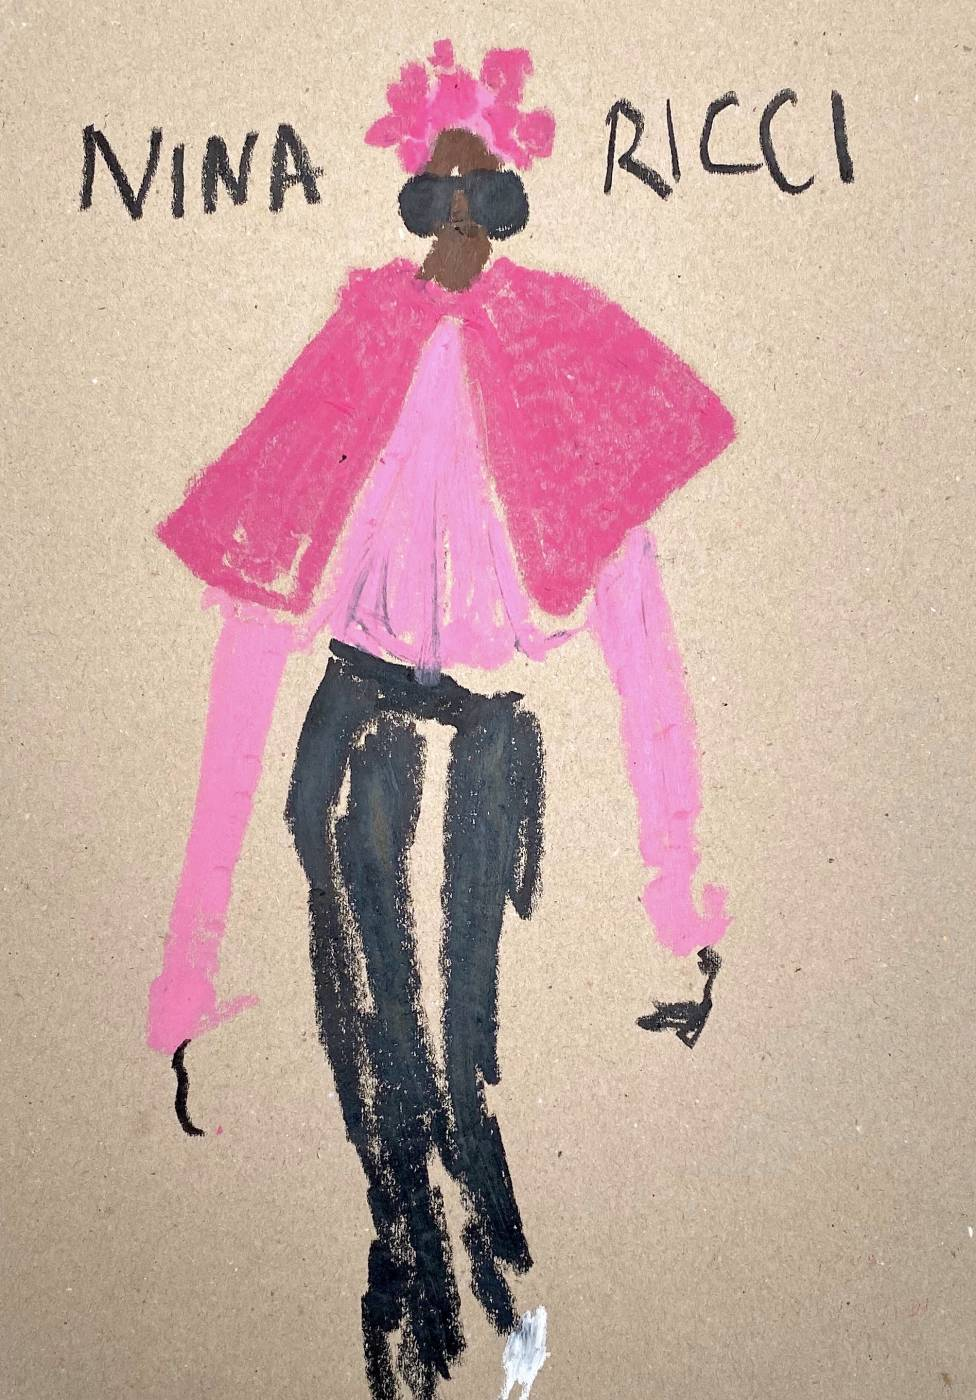 All Pink, Nina Ricci